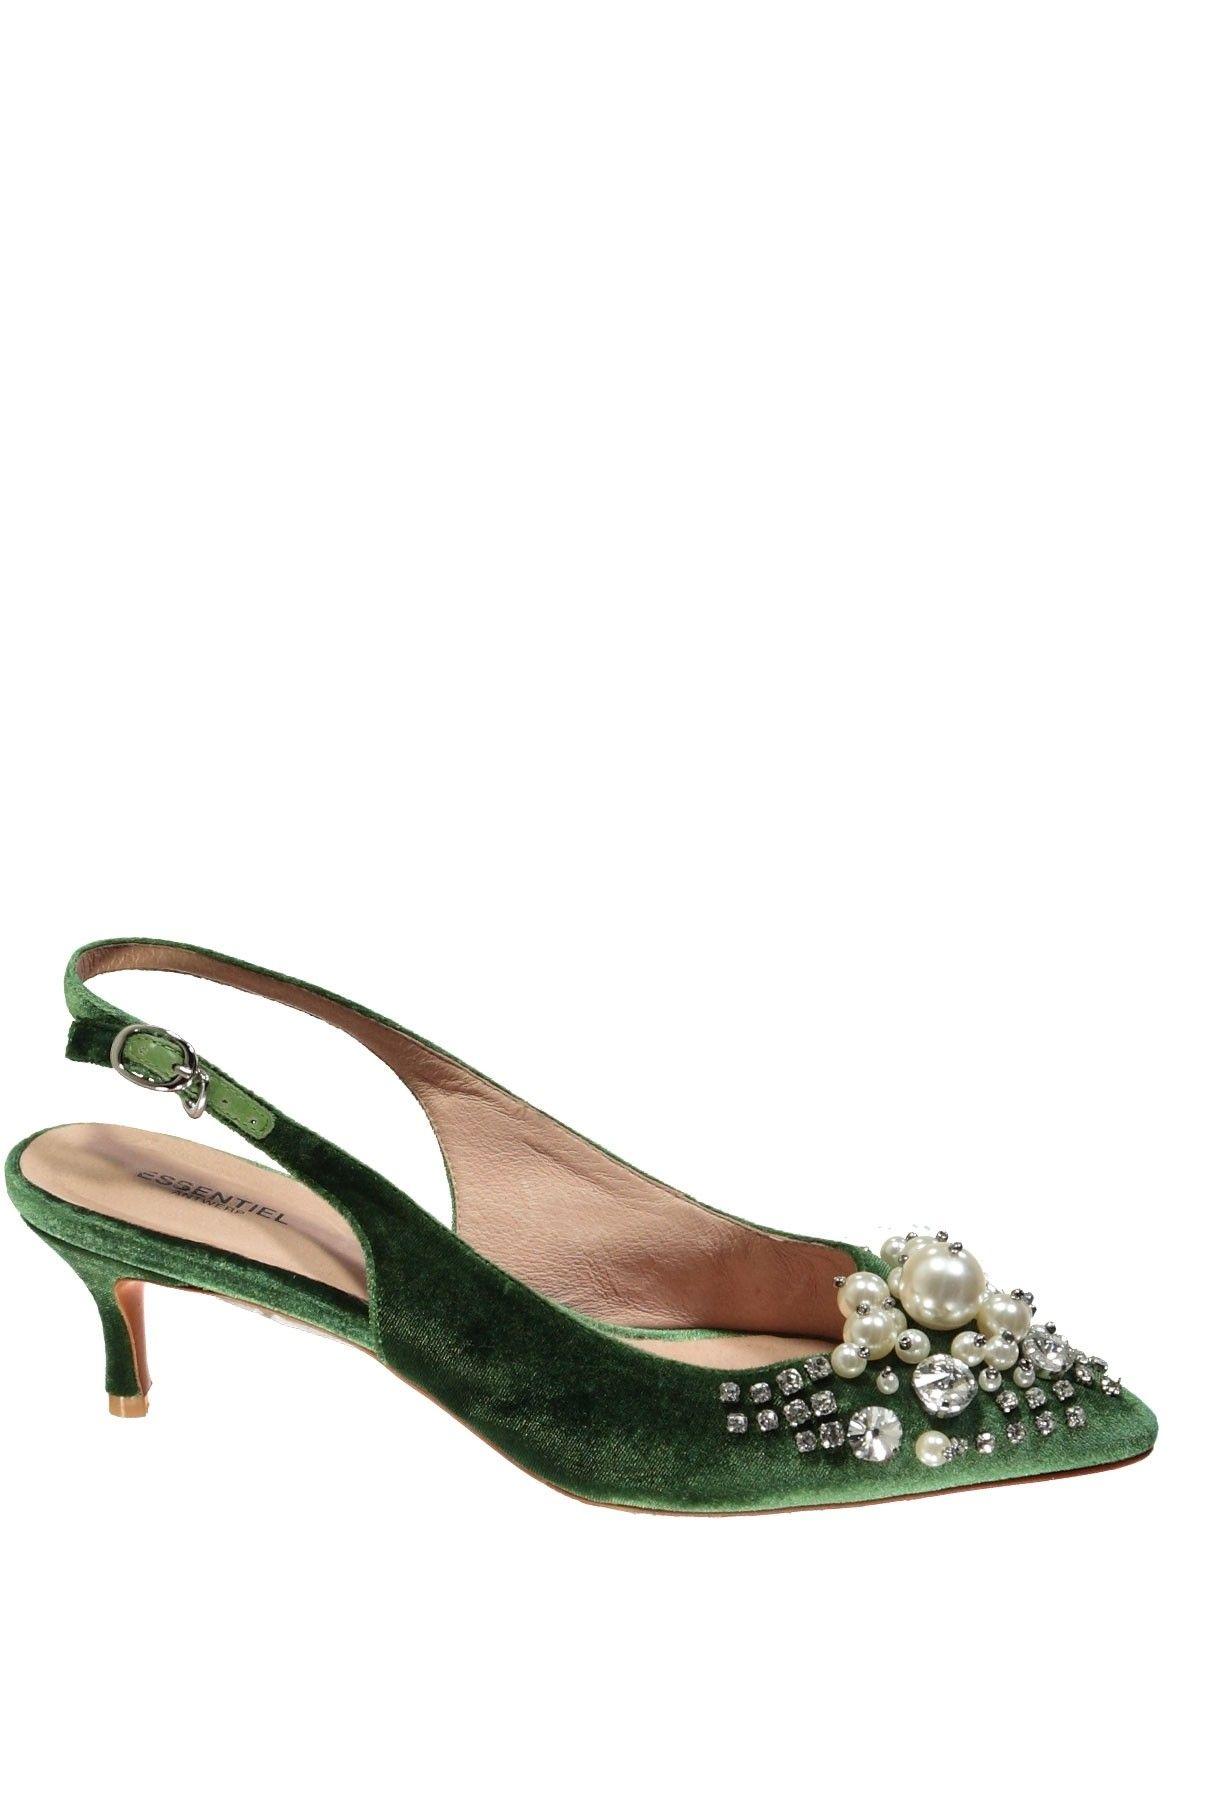 0ed99b97358 Essentiel Antwerp heels